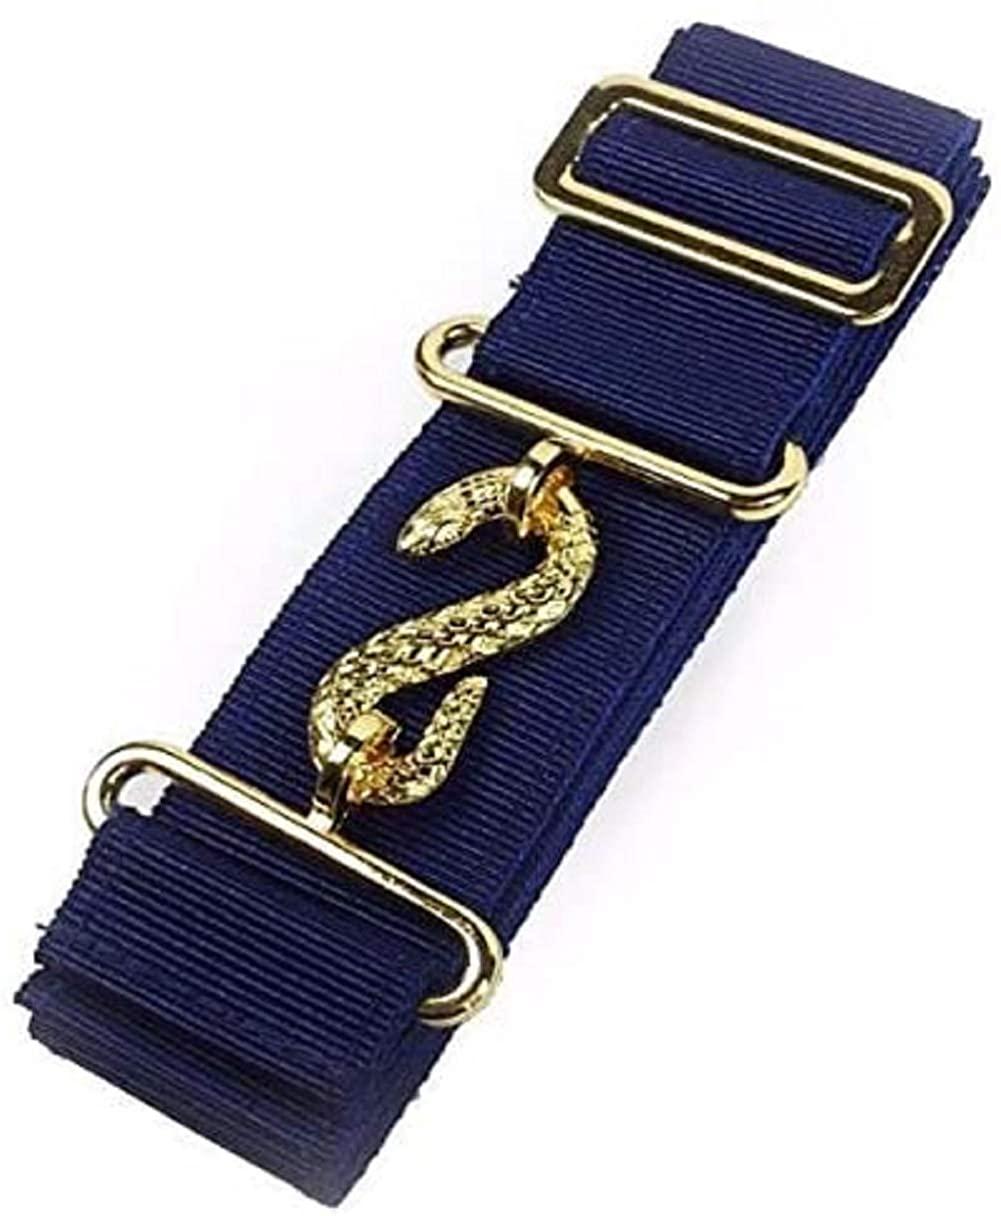 Masonic Belt Extender Navy